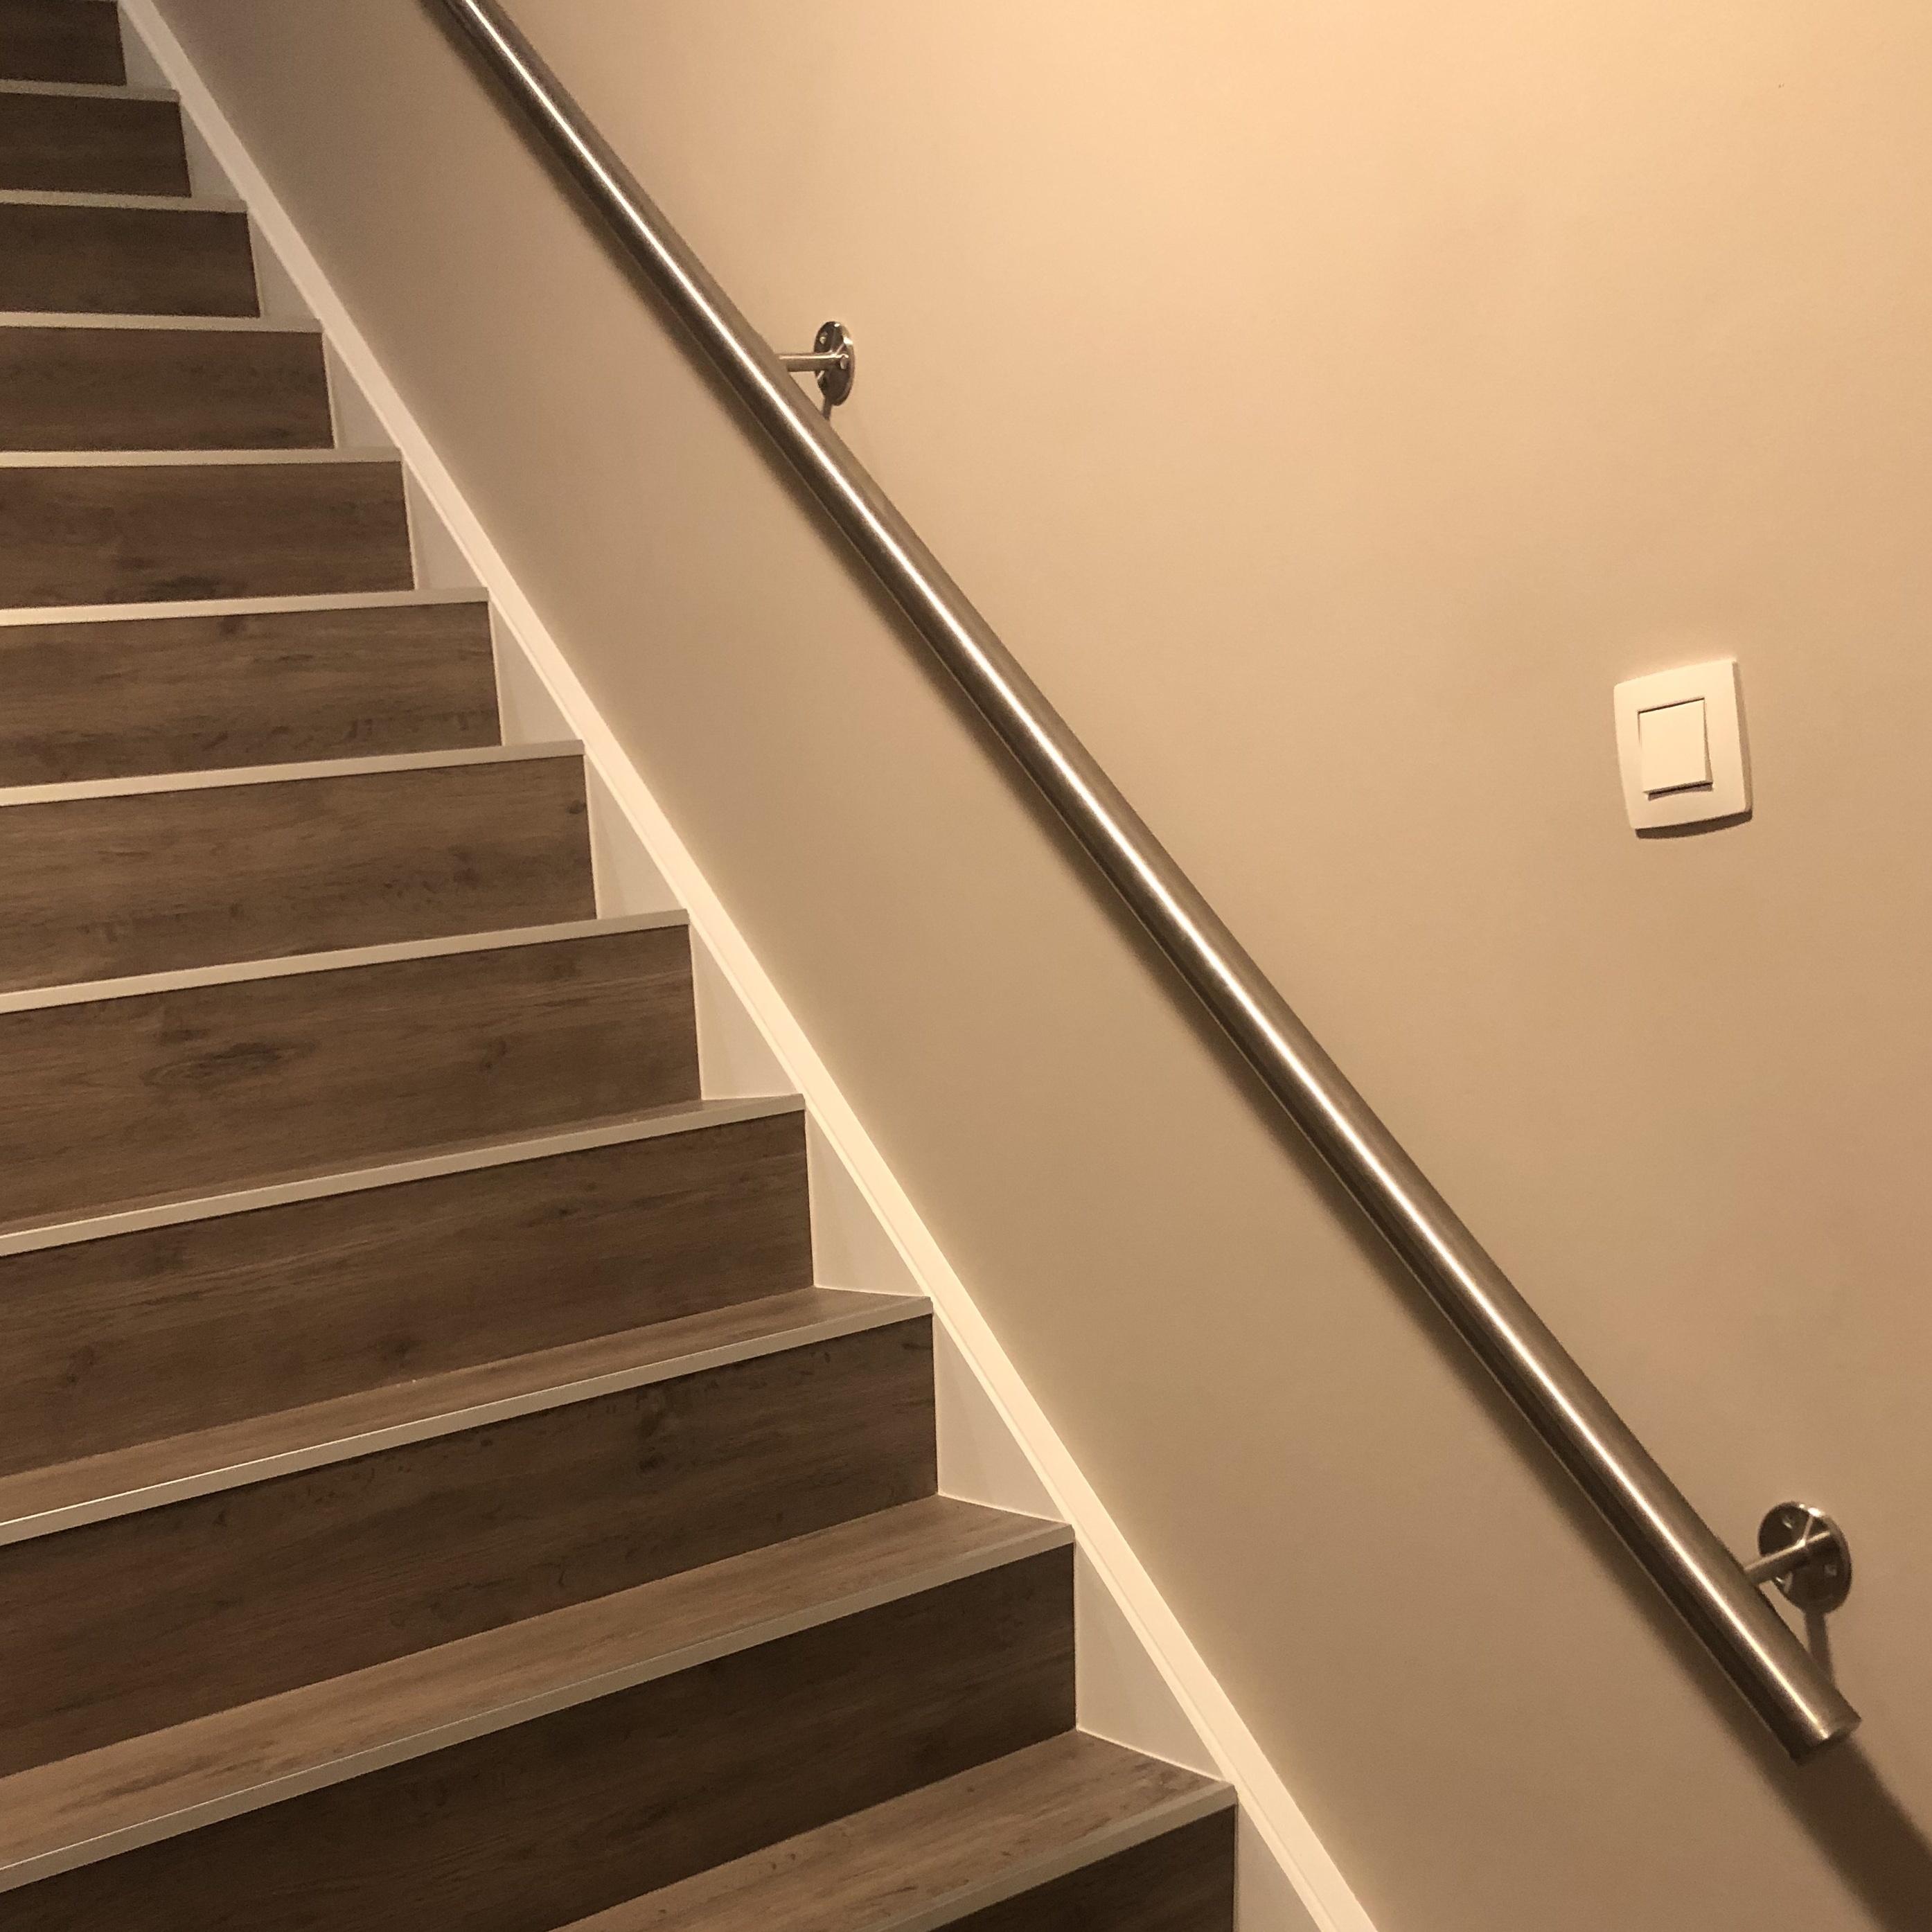 Handlauf Edelstahl rund gebürstet Modell 4 - Runde Edelstahl Treppengeländer - Treppenhandlauf